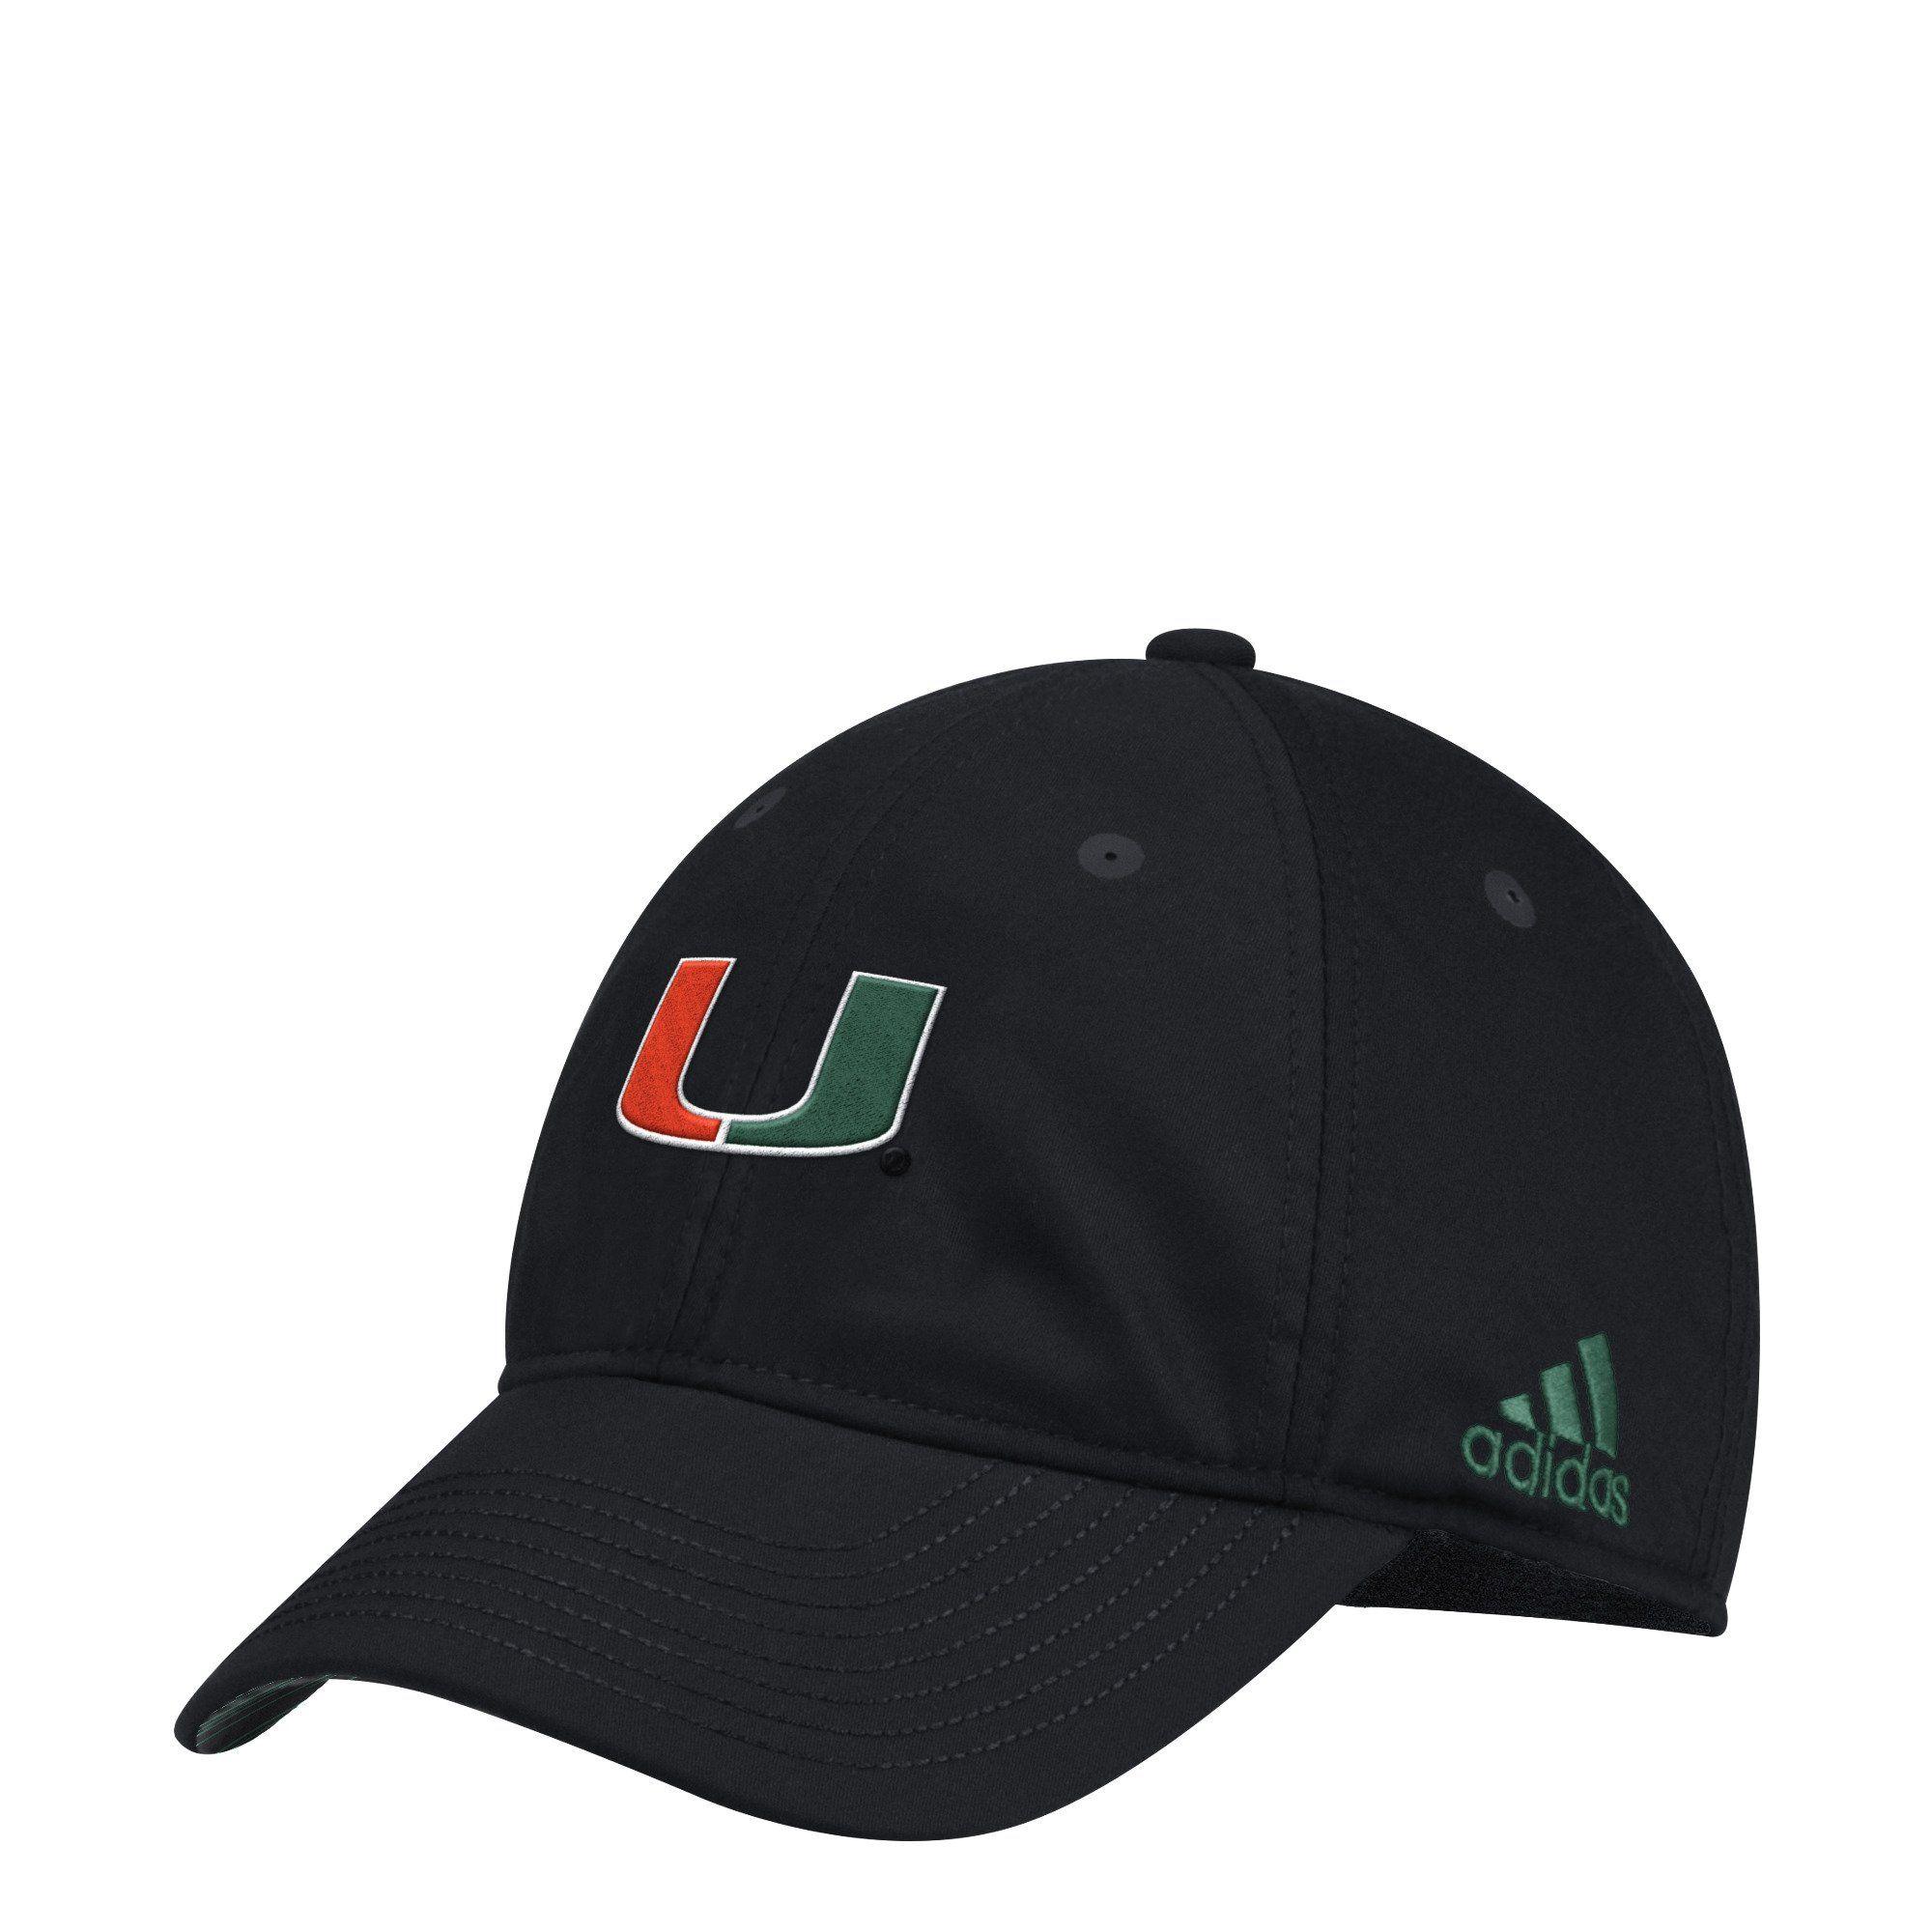 sneakers for cheap 6b75a 7d978 Miami Hurricanes adidas 2018 Coaches U Slouch Flex Hat - Black